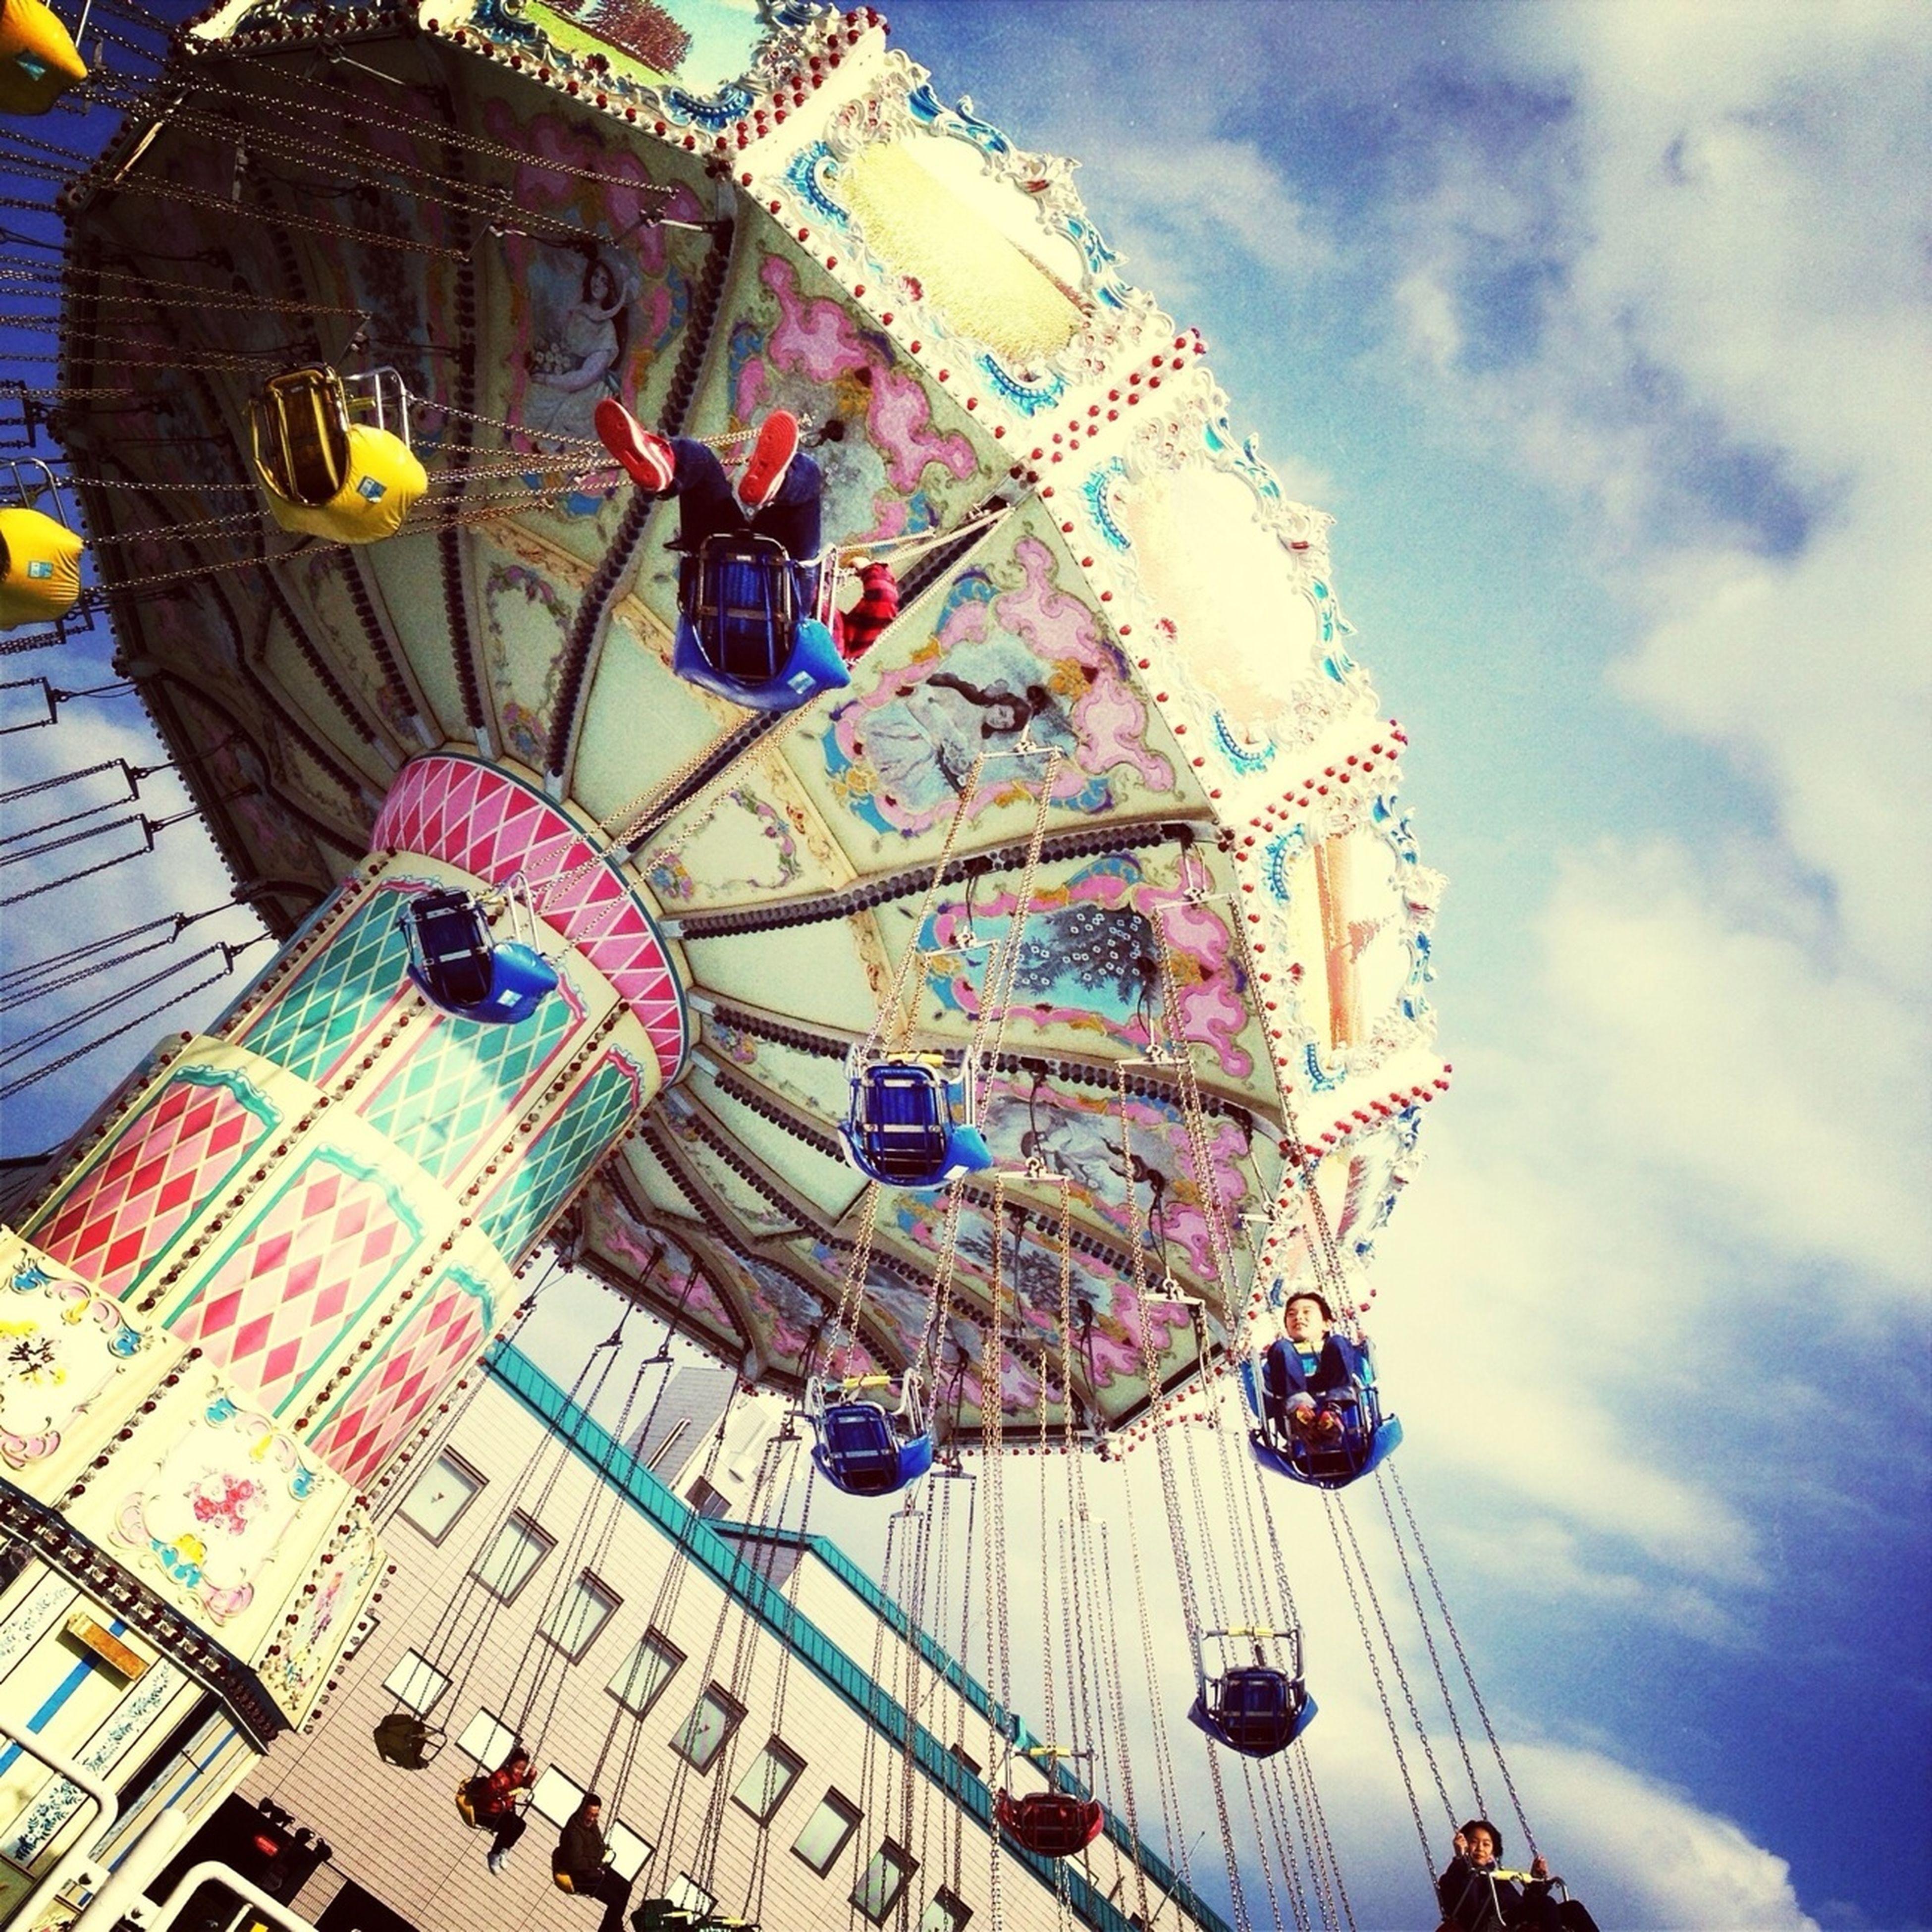 amusement park, amusement park ride, ferris wheel, arts culture and entertainment, low angle view, sky, cloud - sky, built structure, architecture, fun, travel, multi colored, day, transportation, outdoors, chain swing ride, tourism, travel destinations, incidental people, cloudy